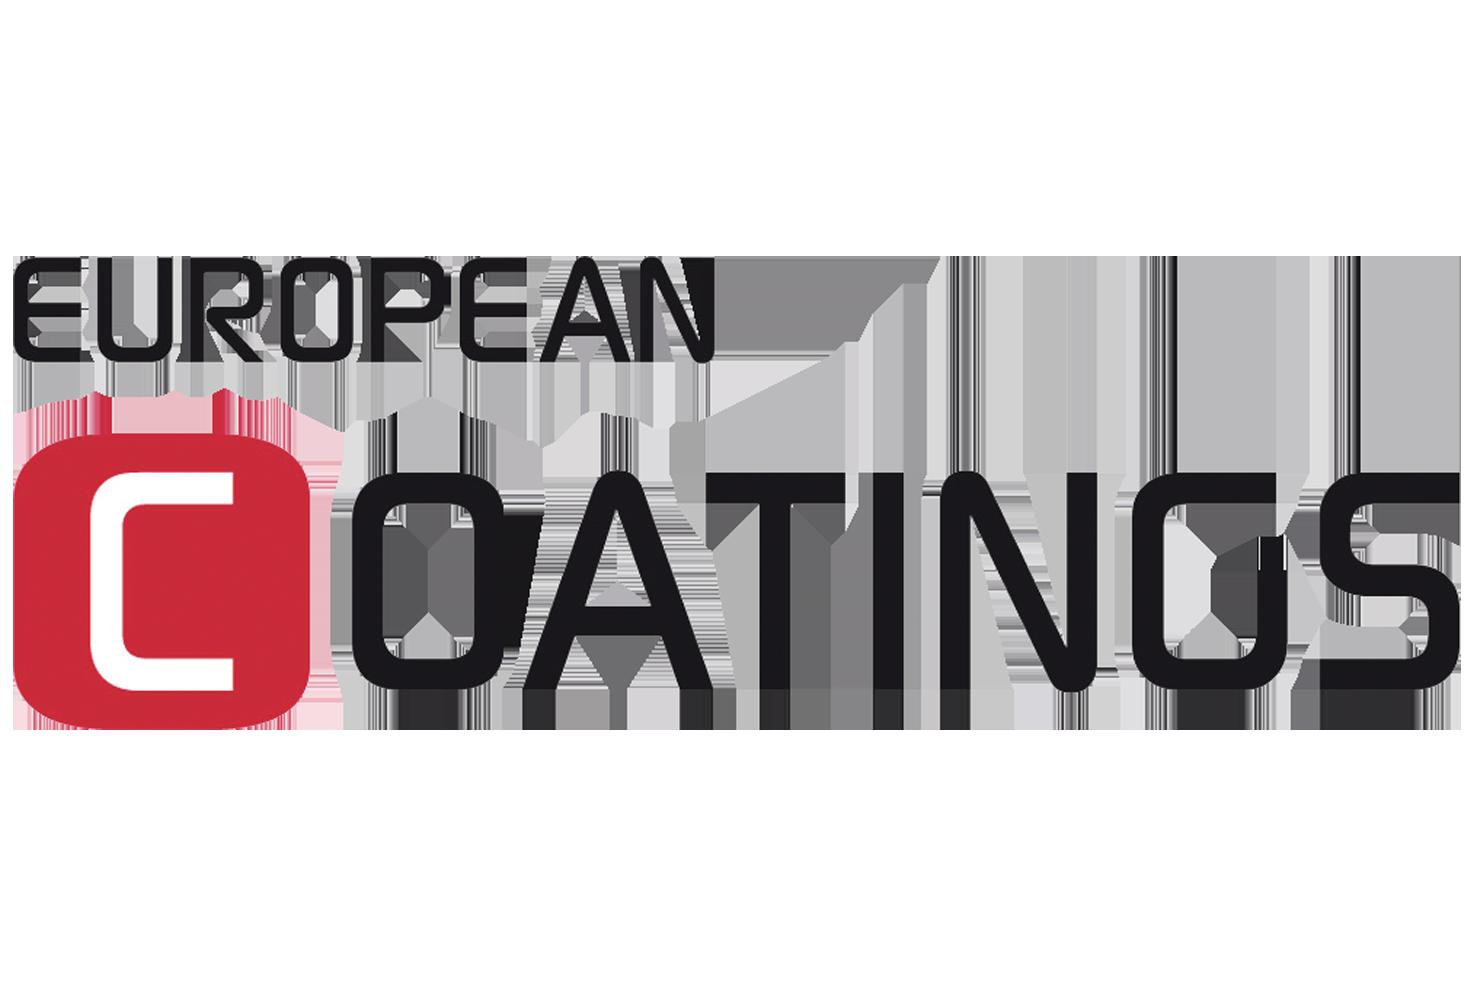 EUROPEAN COATINGS SHOW 2011